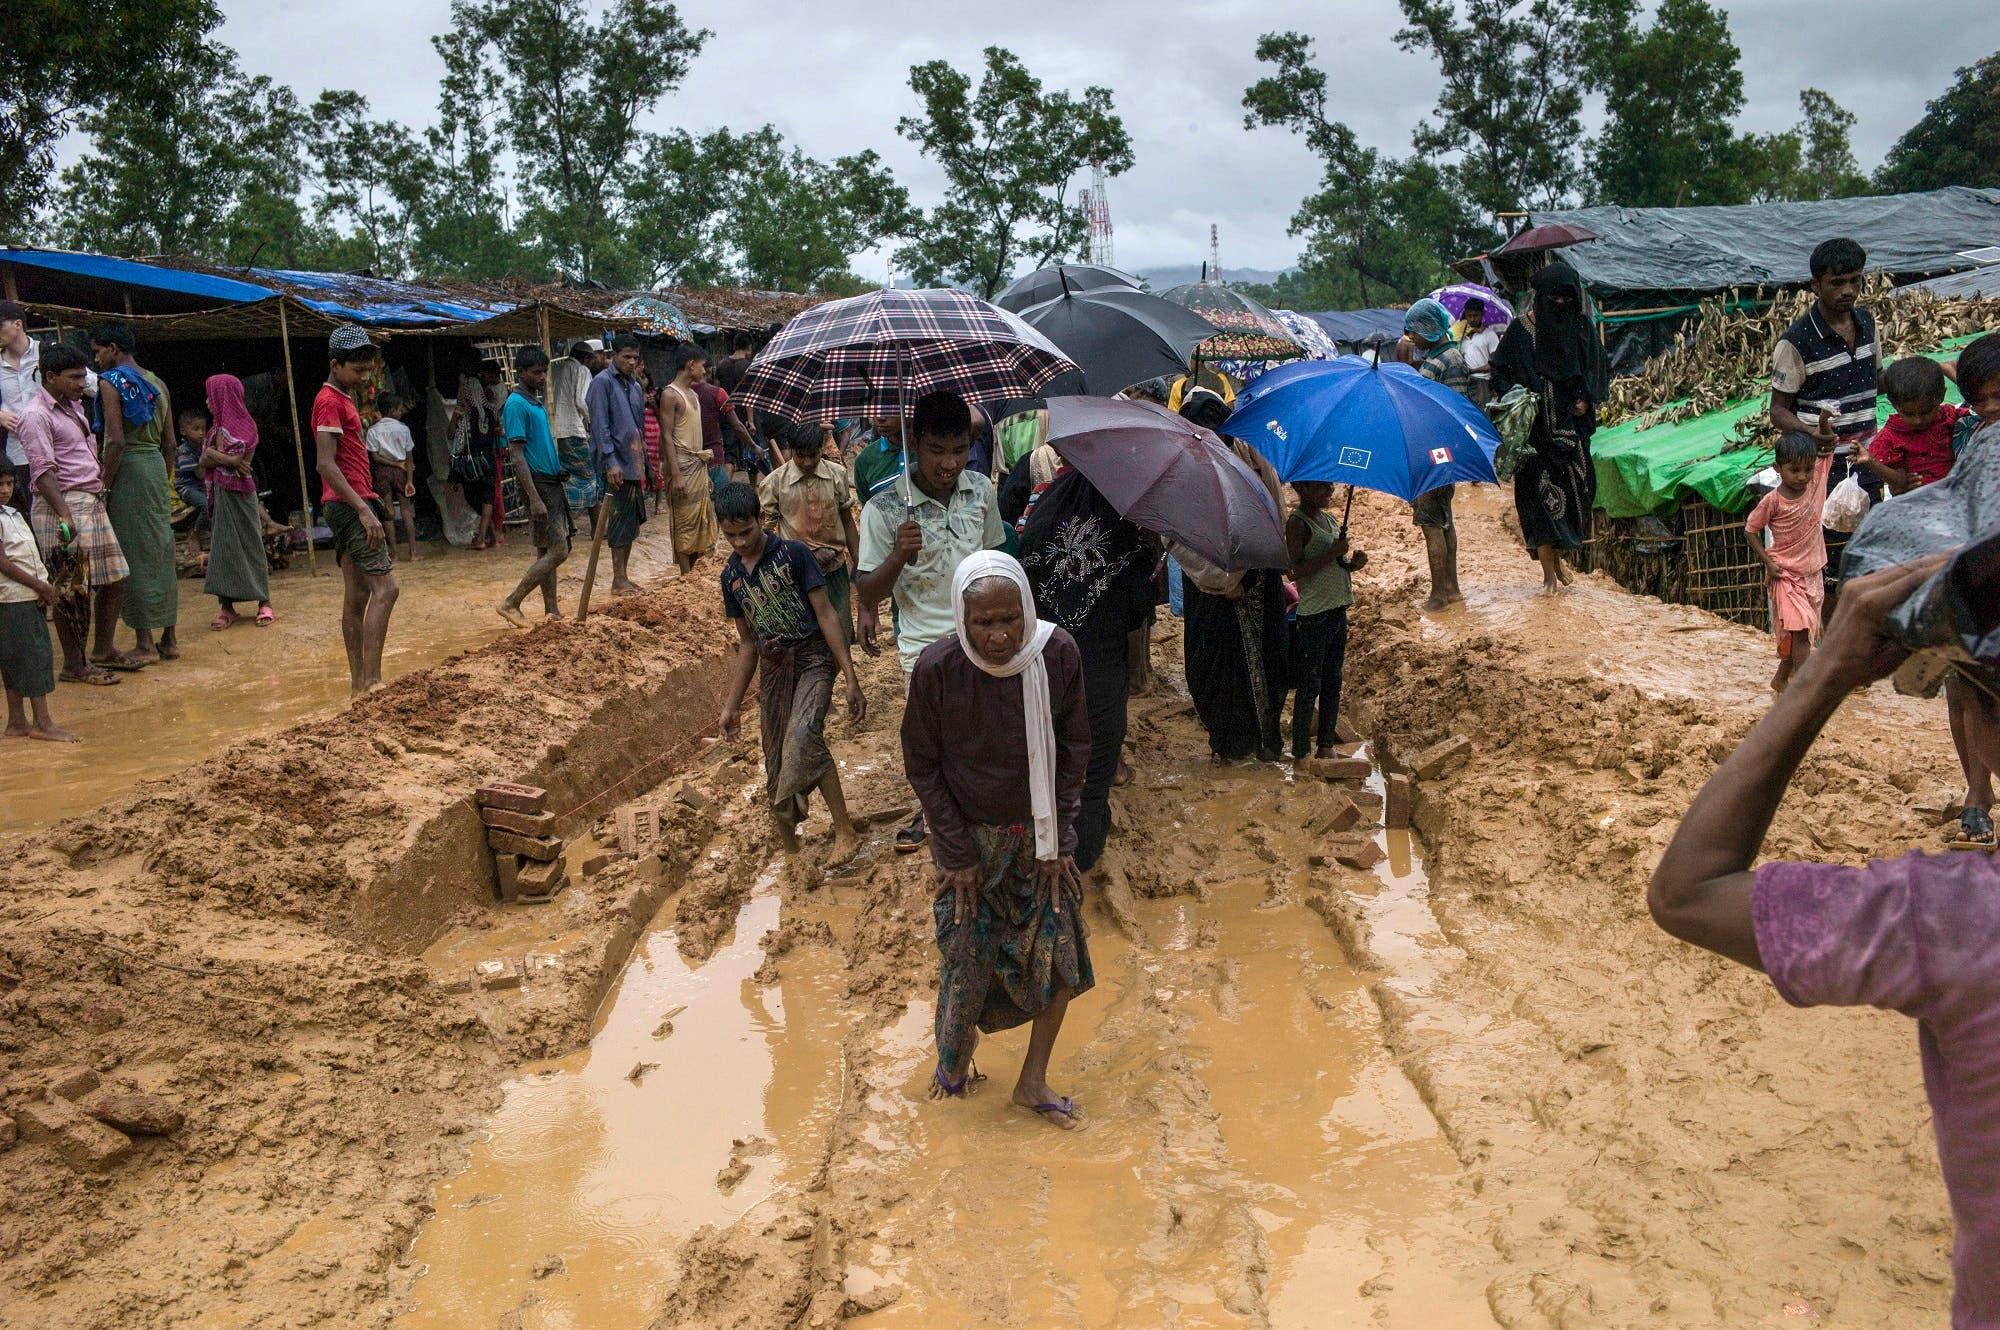 Rohingya Muslim refugees walk through Kutupalong refugee camp in the Bangladeshi district of Ukhia on September 28, 2017. (AFP)